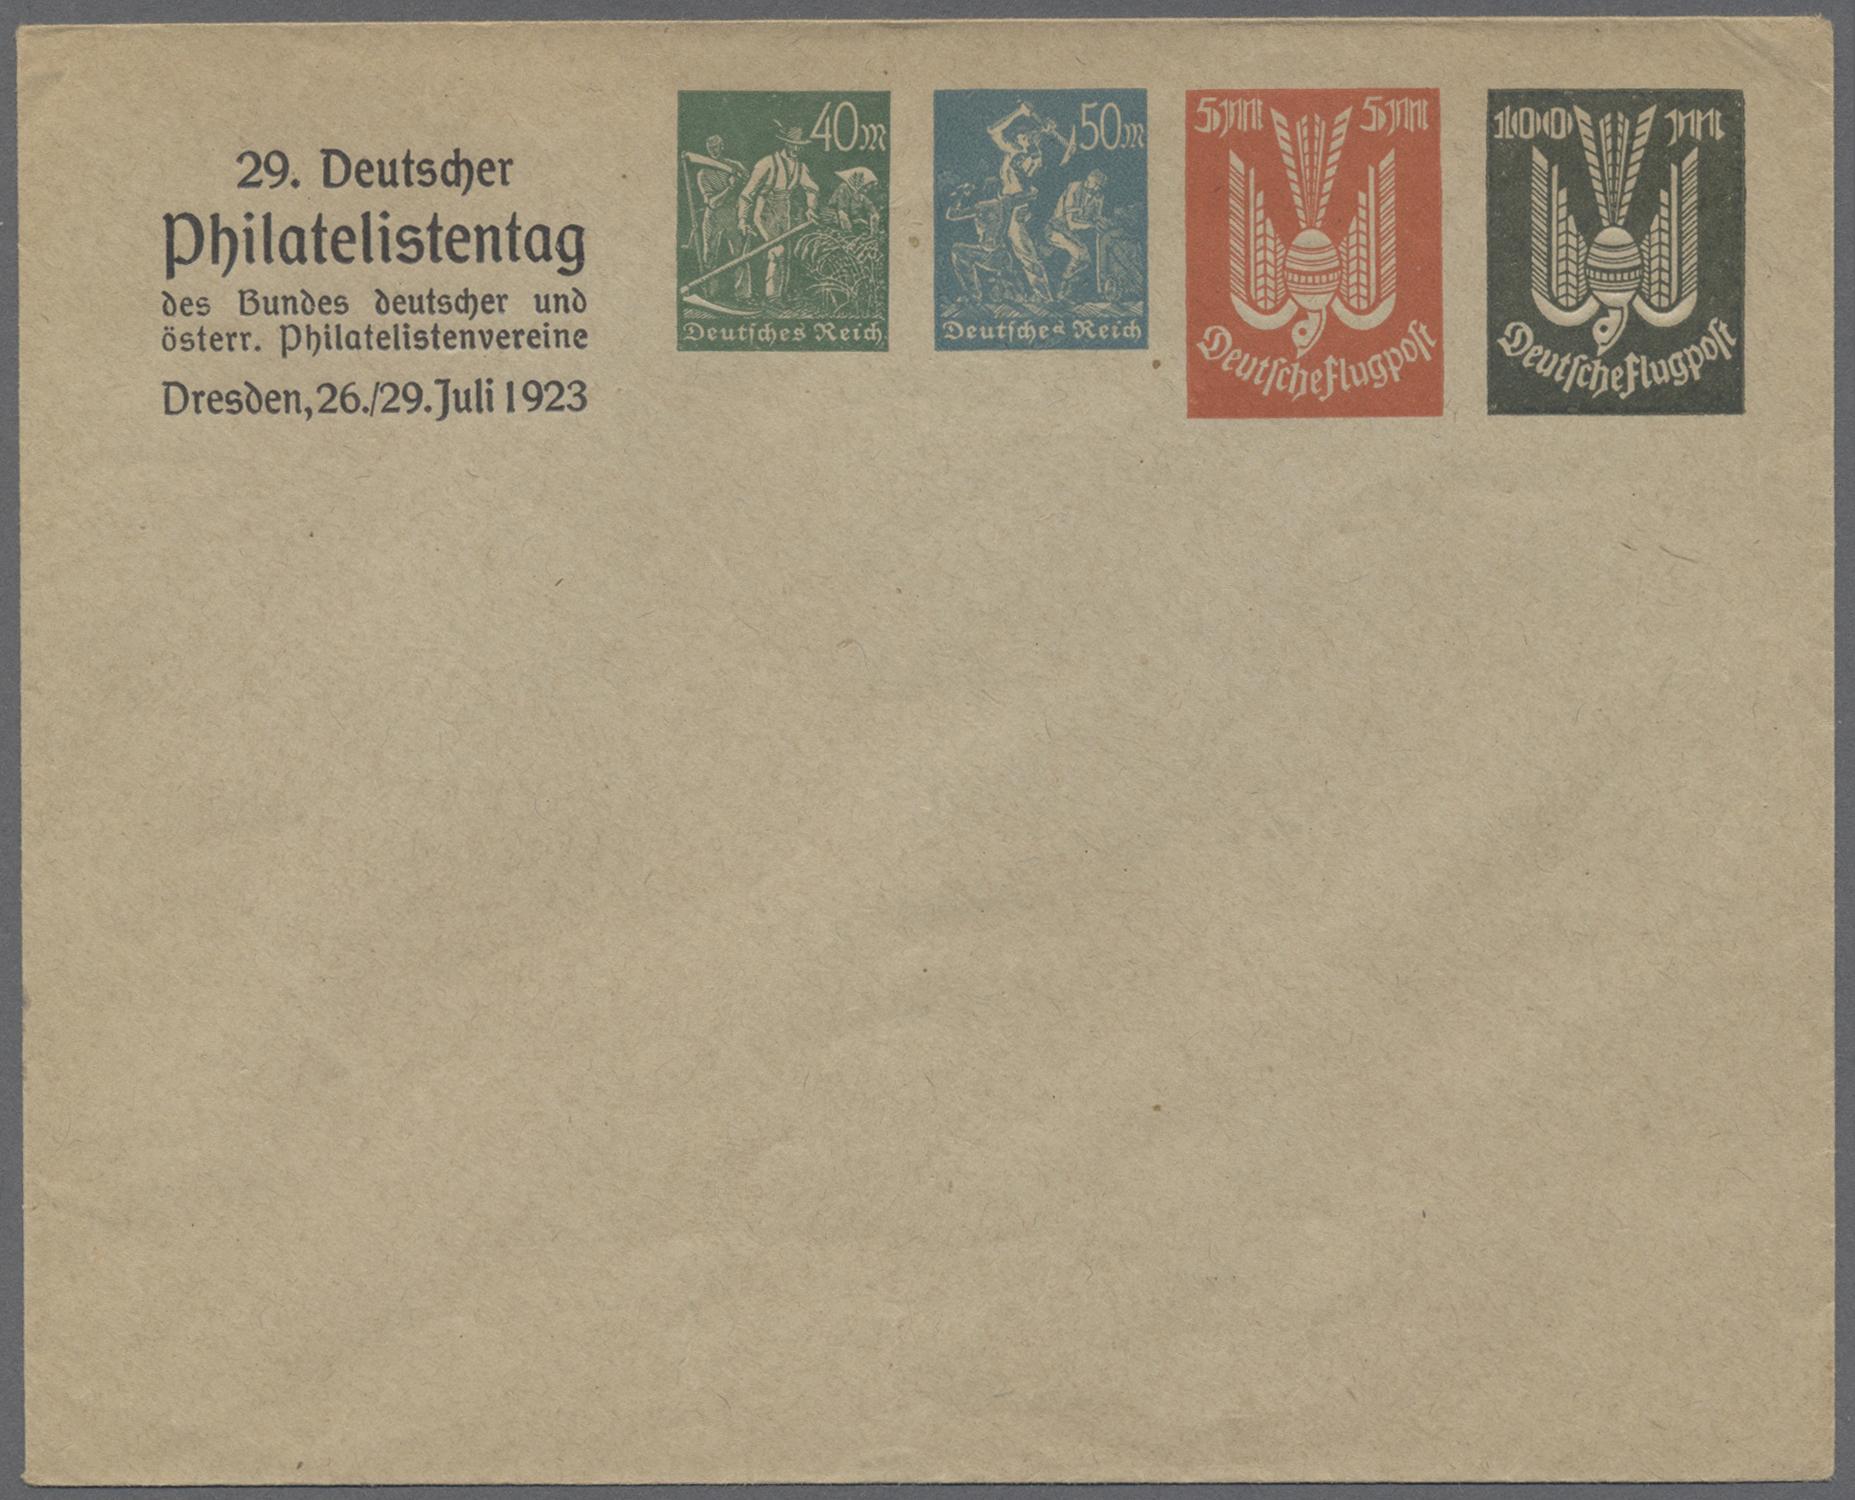 Lot 37135 - Deutsches Reich - Privatganzsachen  -  Auktionshaus Christoph Gärtner GmbH & Co. KG Collections Germany,  Collections Supplement, Surprise boxes #39 Day 7